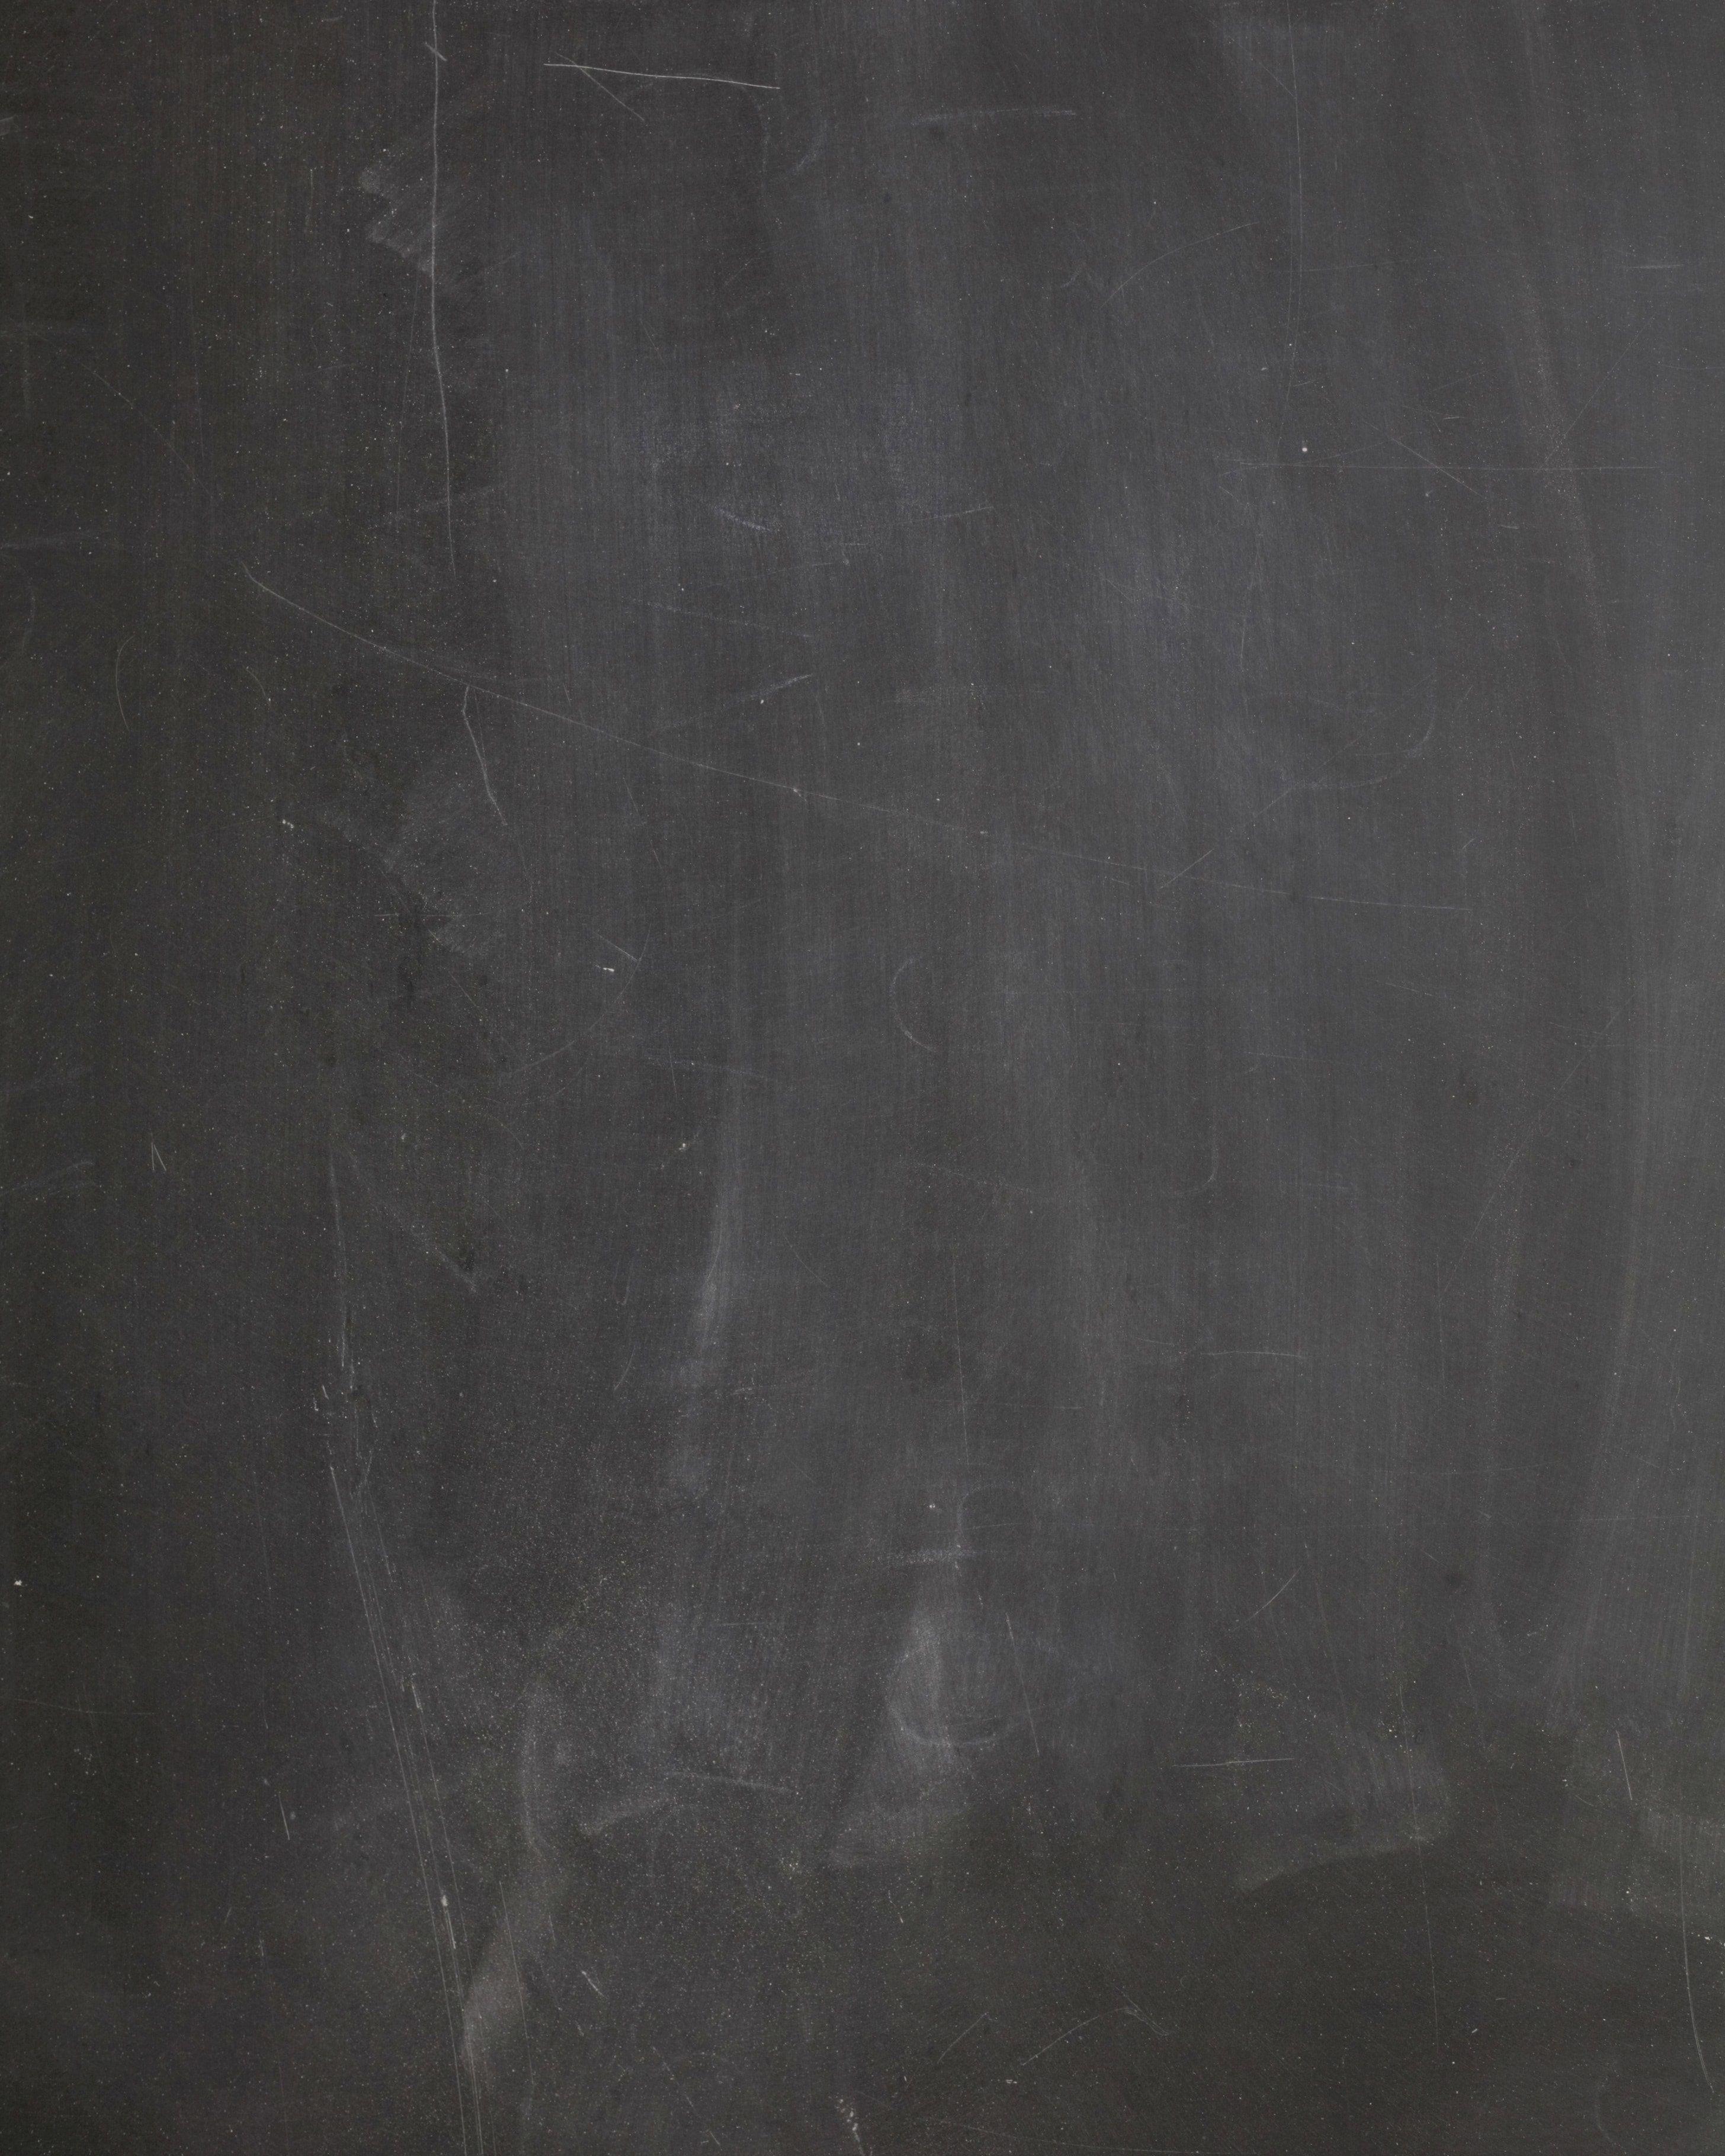 002 Awful Chalkboard Template Microsoft Word Idea  Editable MenuFull